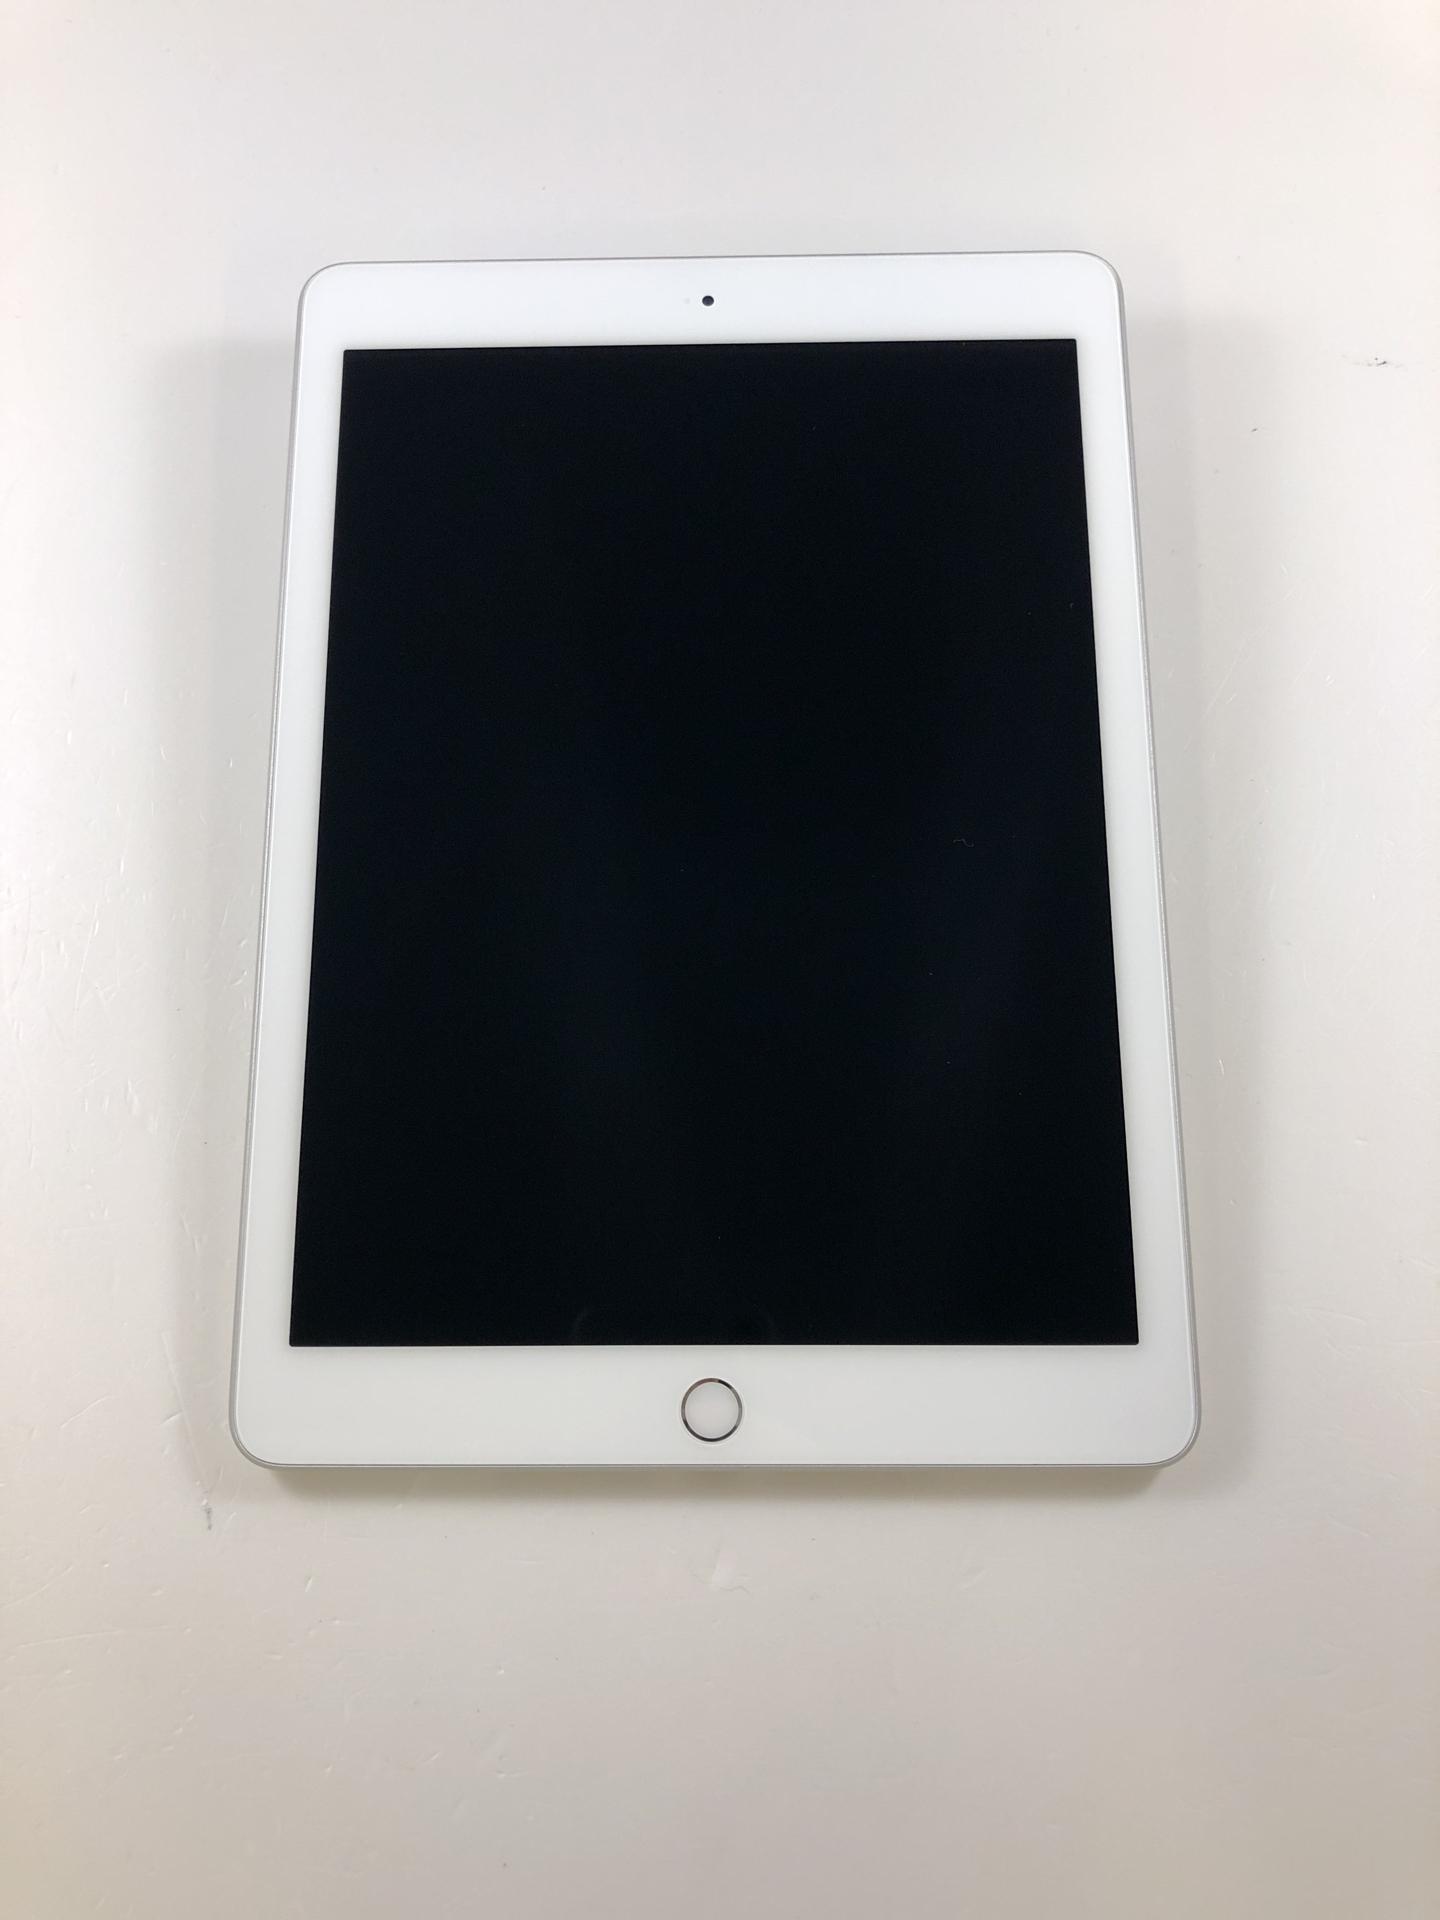 iPad 6 Wi-Fi 128GB, 128GB, Silver, immagine 1